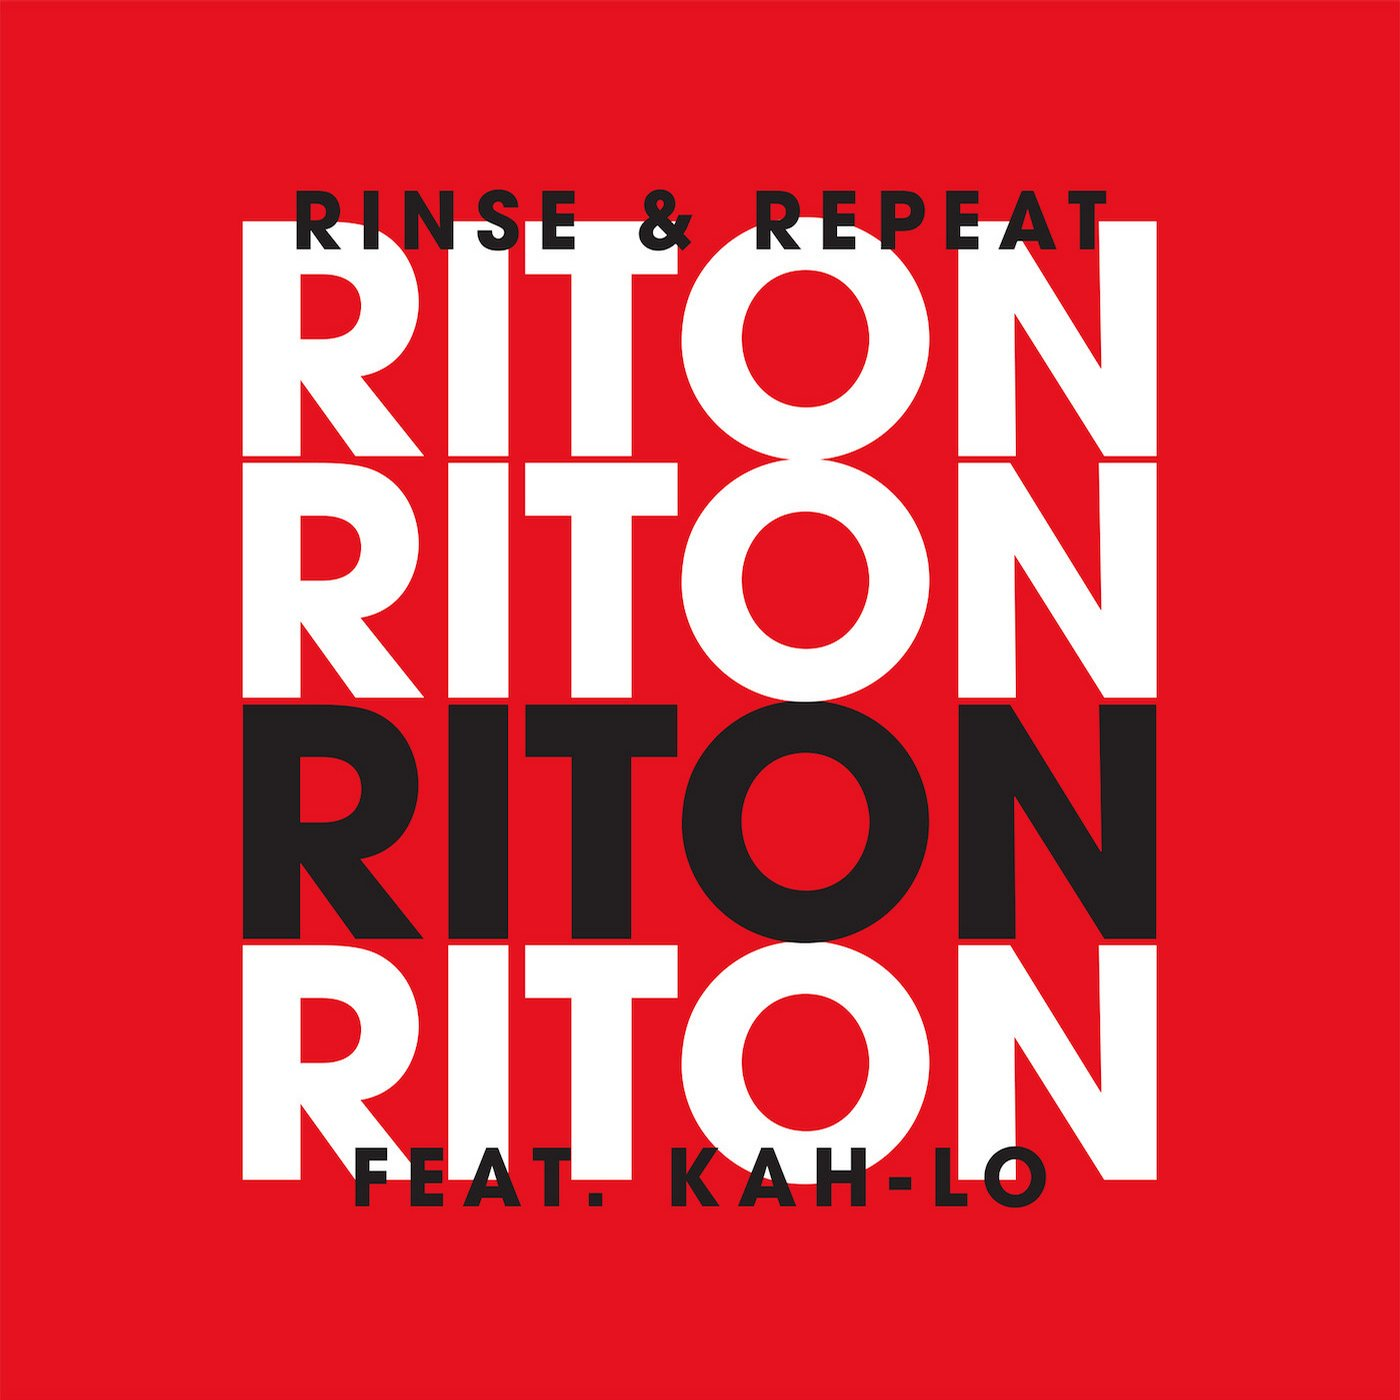 Riton feat kah-lo rinse and repeat (mosangels radio edit.